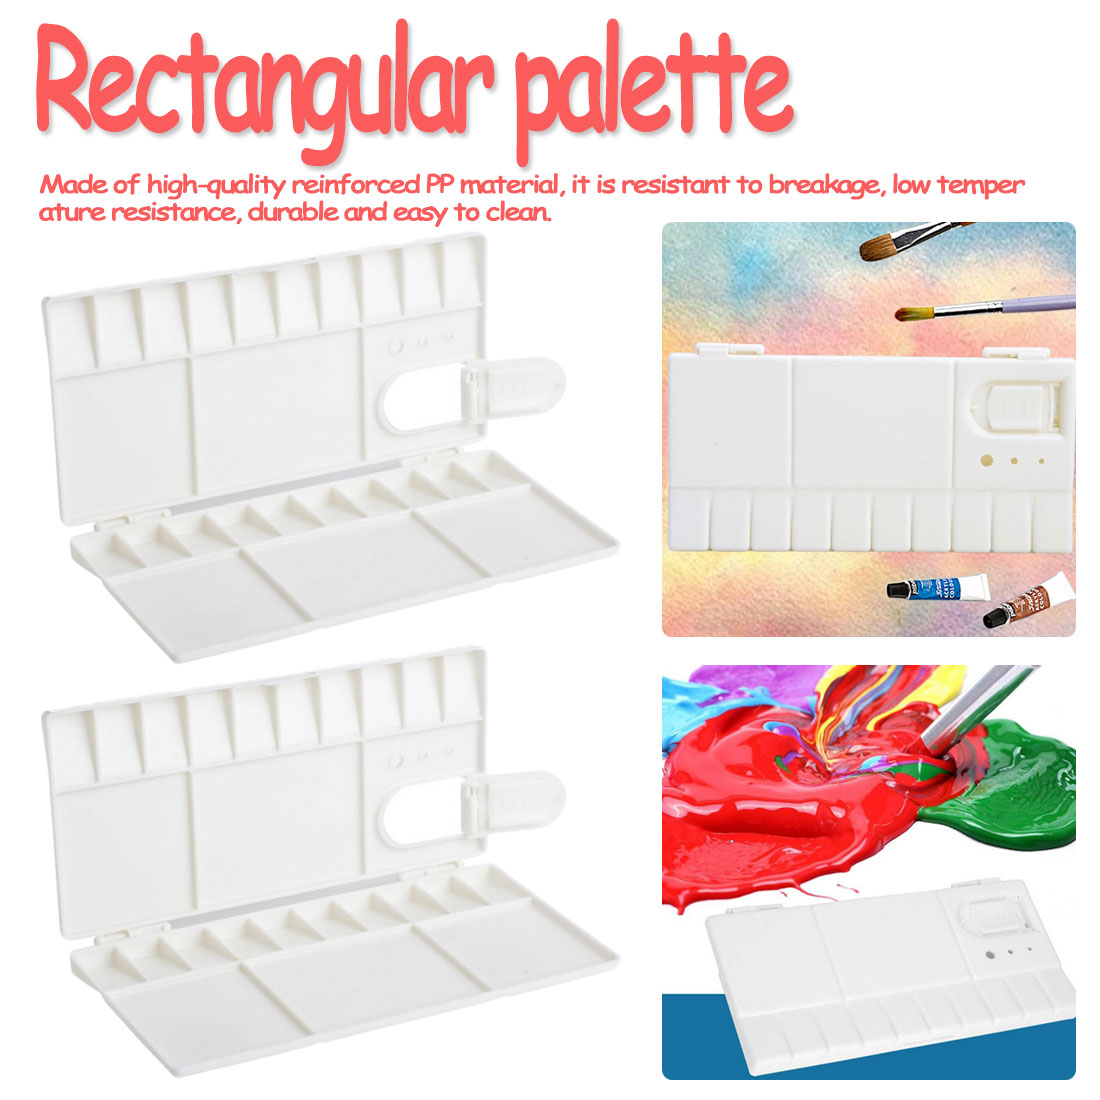 25 Grids Palette Empty Watercolor Paints Tins Box With Full Pans Half Pans For Art Gouache Acrylic Painting Art Supplies